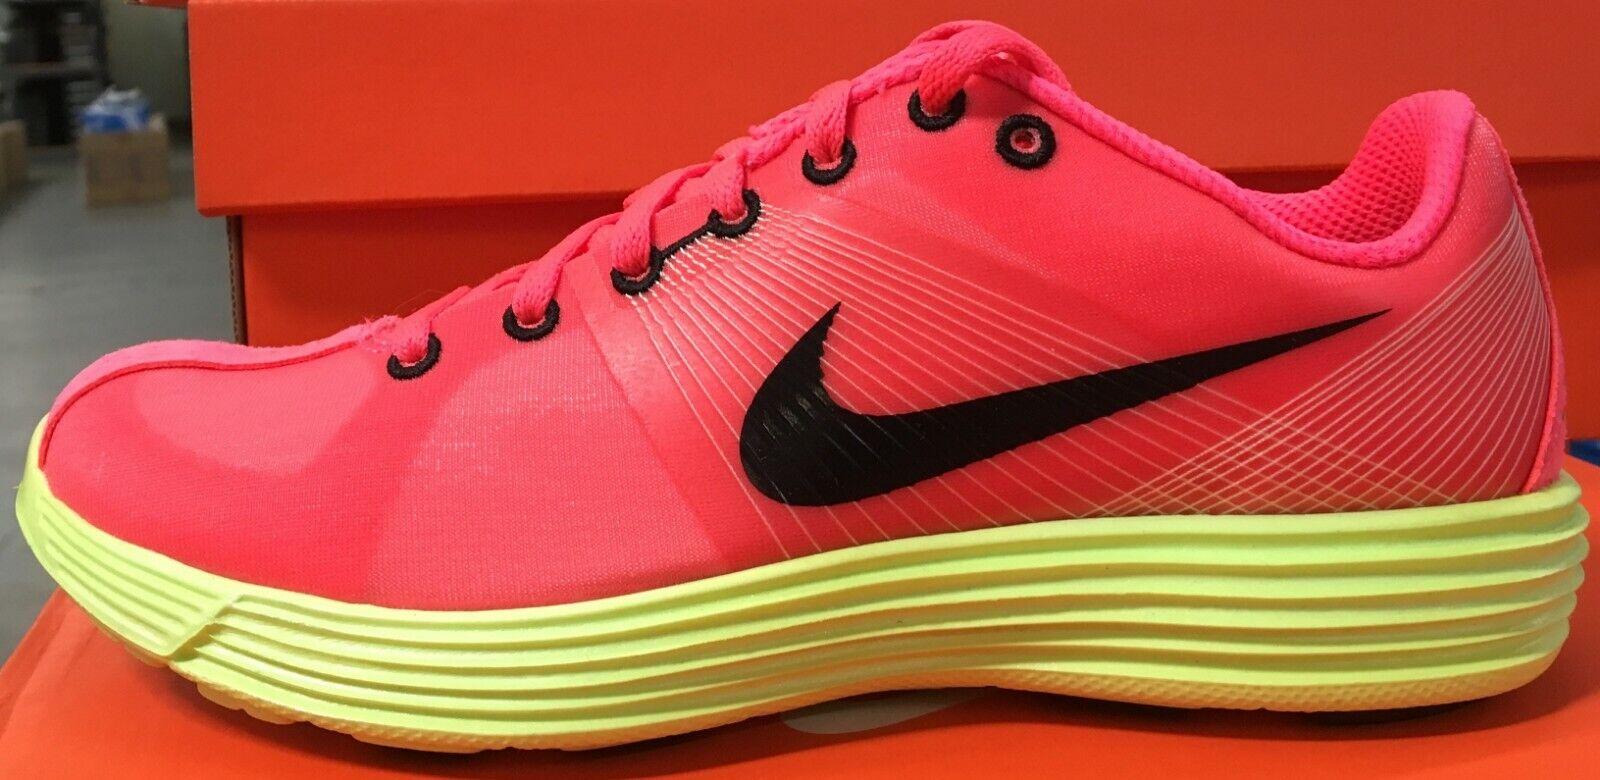 Vente  Nike Legend lunaracer + femmes Running Training chaussures Hot Punch 324903 603 H